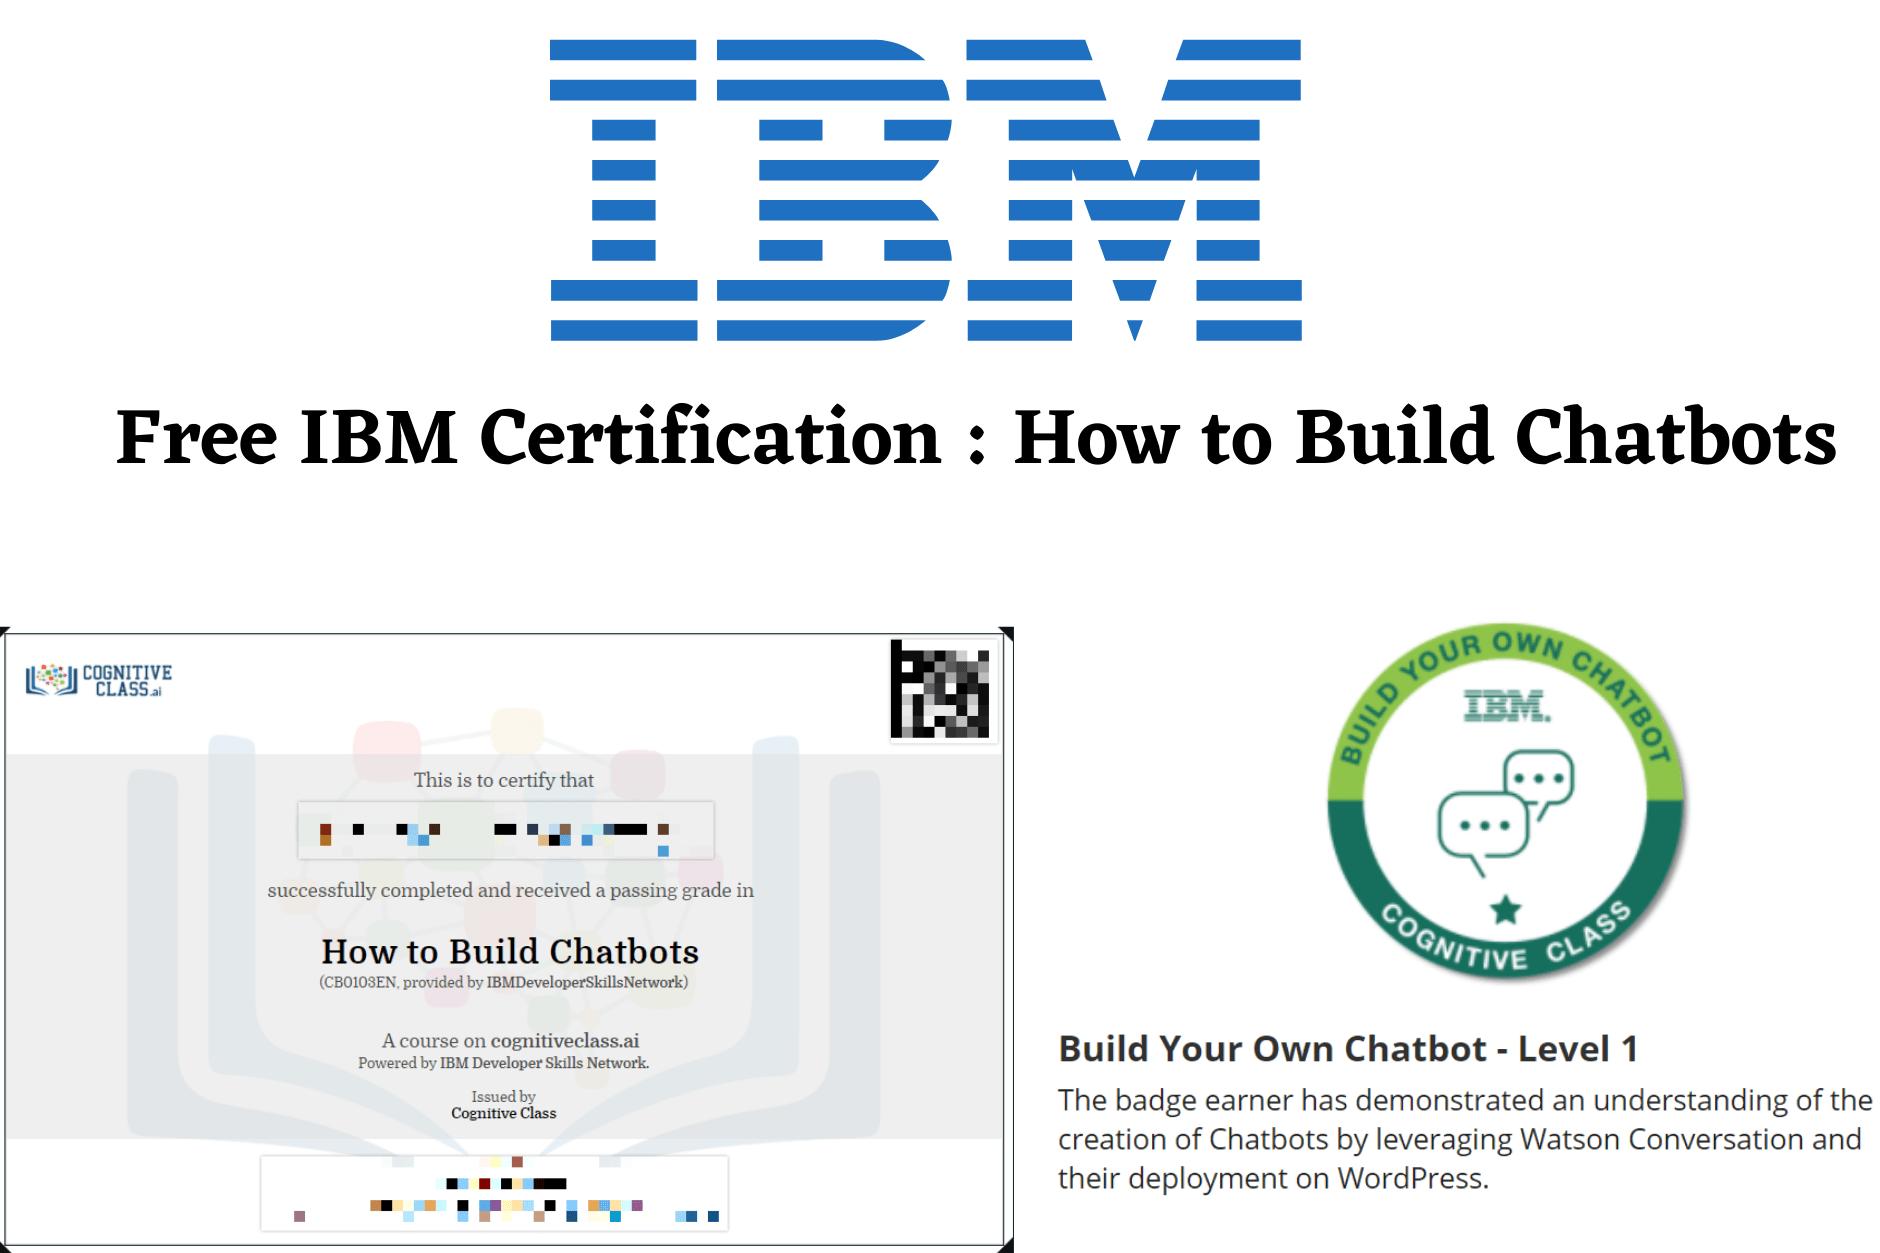 ibm certification chatbots build